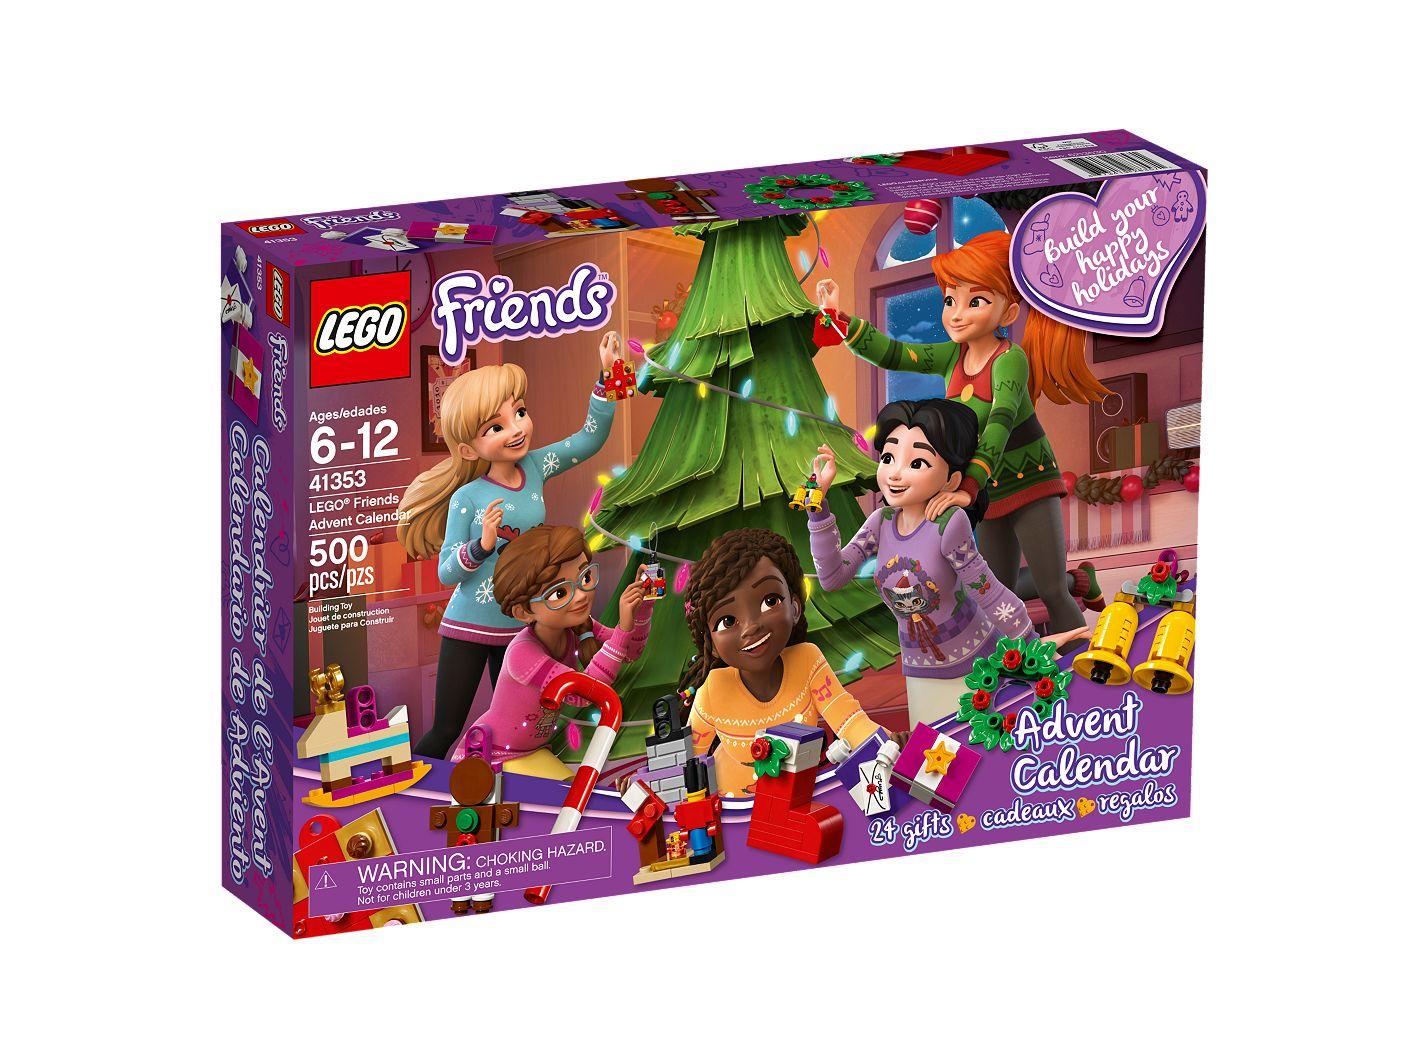 Calendrier Lego Friends 2019.Lego Friends Advent Calendar 41353 Friends Buy Online At The Official Lego Shop Nz